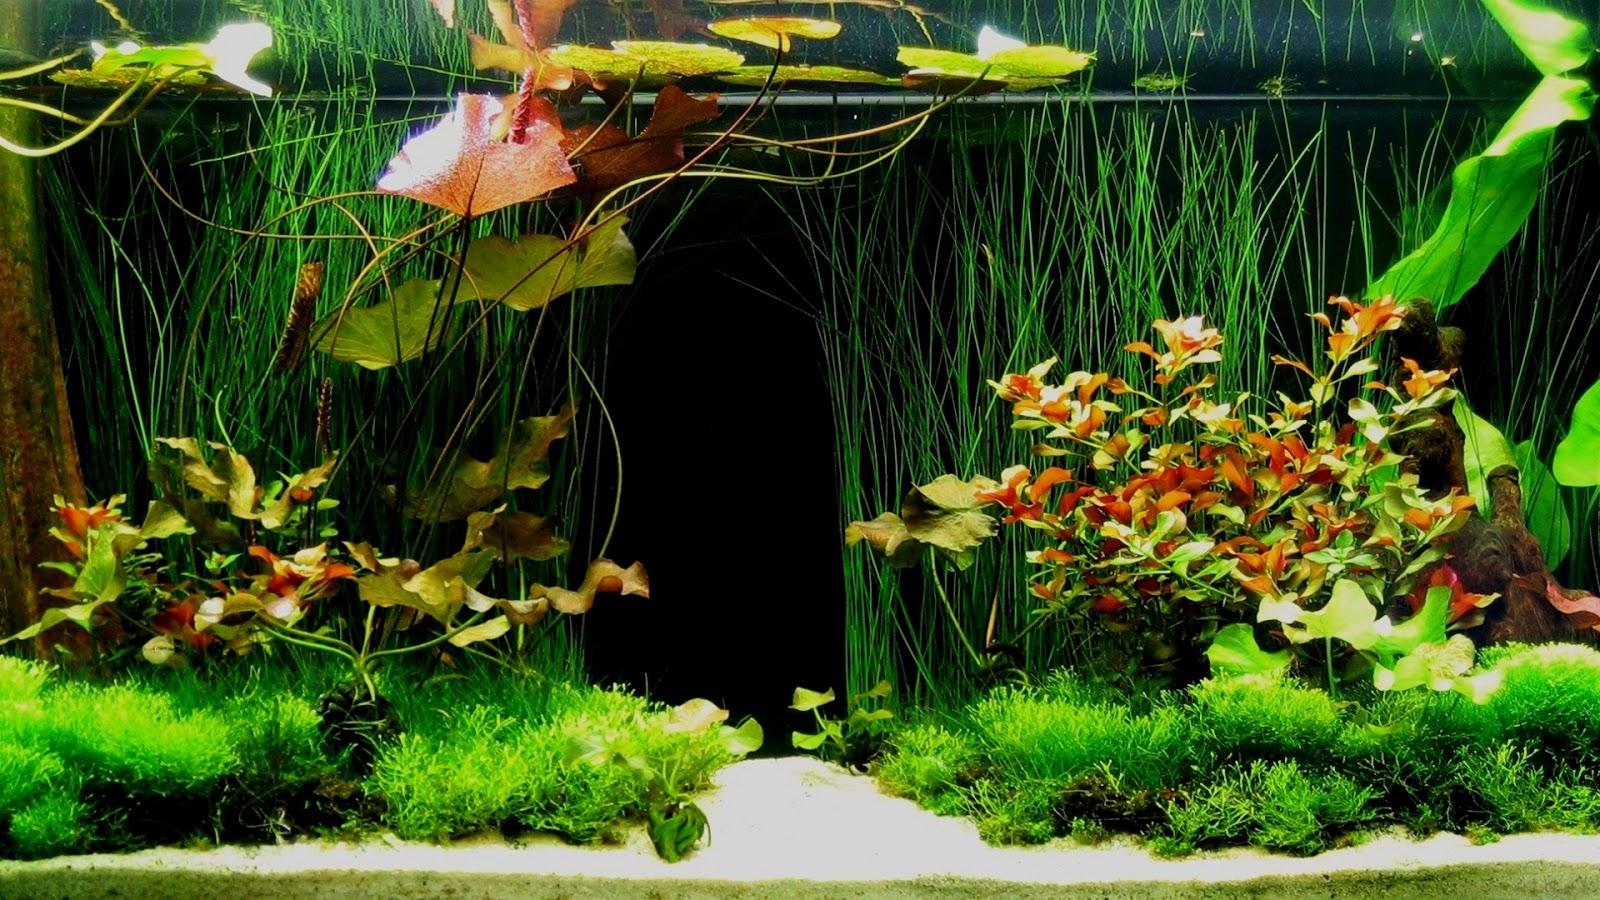 Fish Tank 3d Wallpaper Akvaryum Arka Plan Fon Resmi